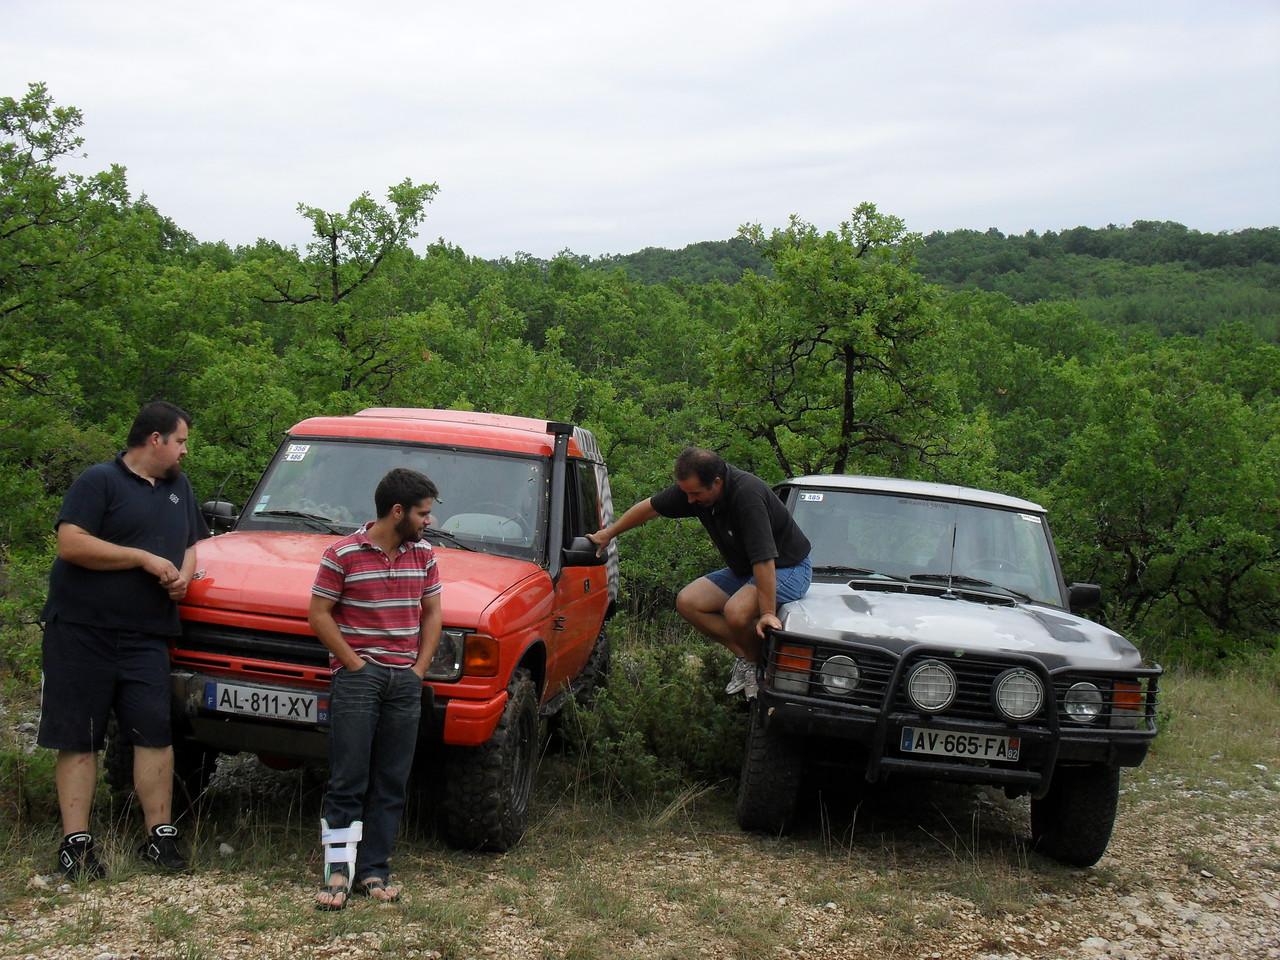 Discovery 300 Tdi , Range Rover 2,4 VM